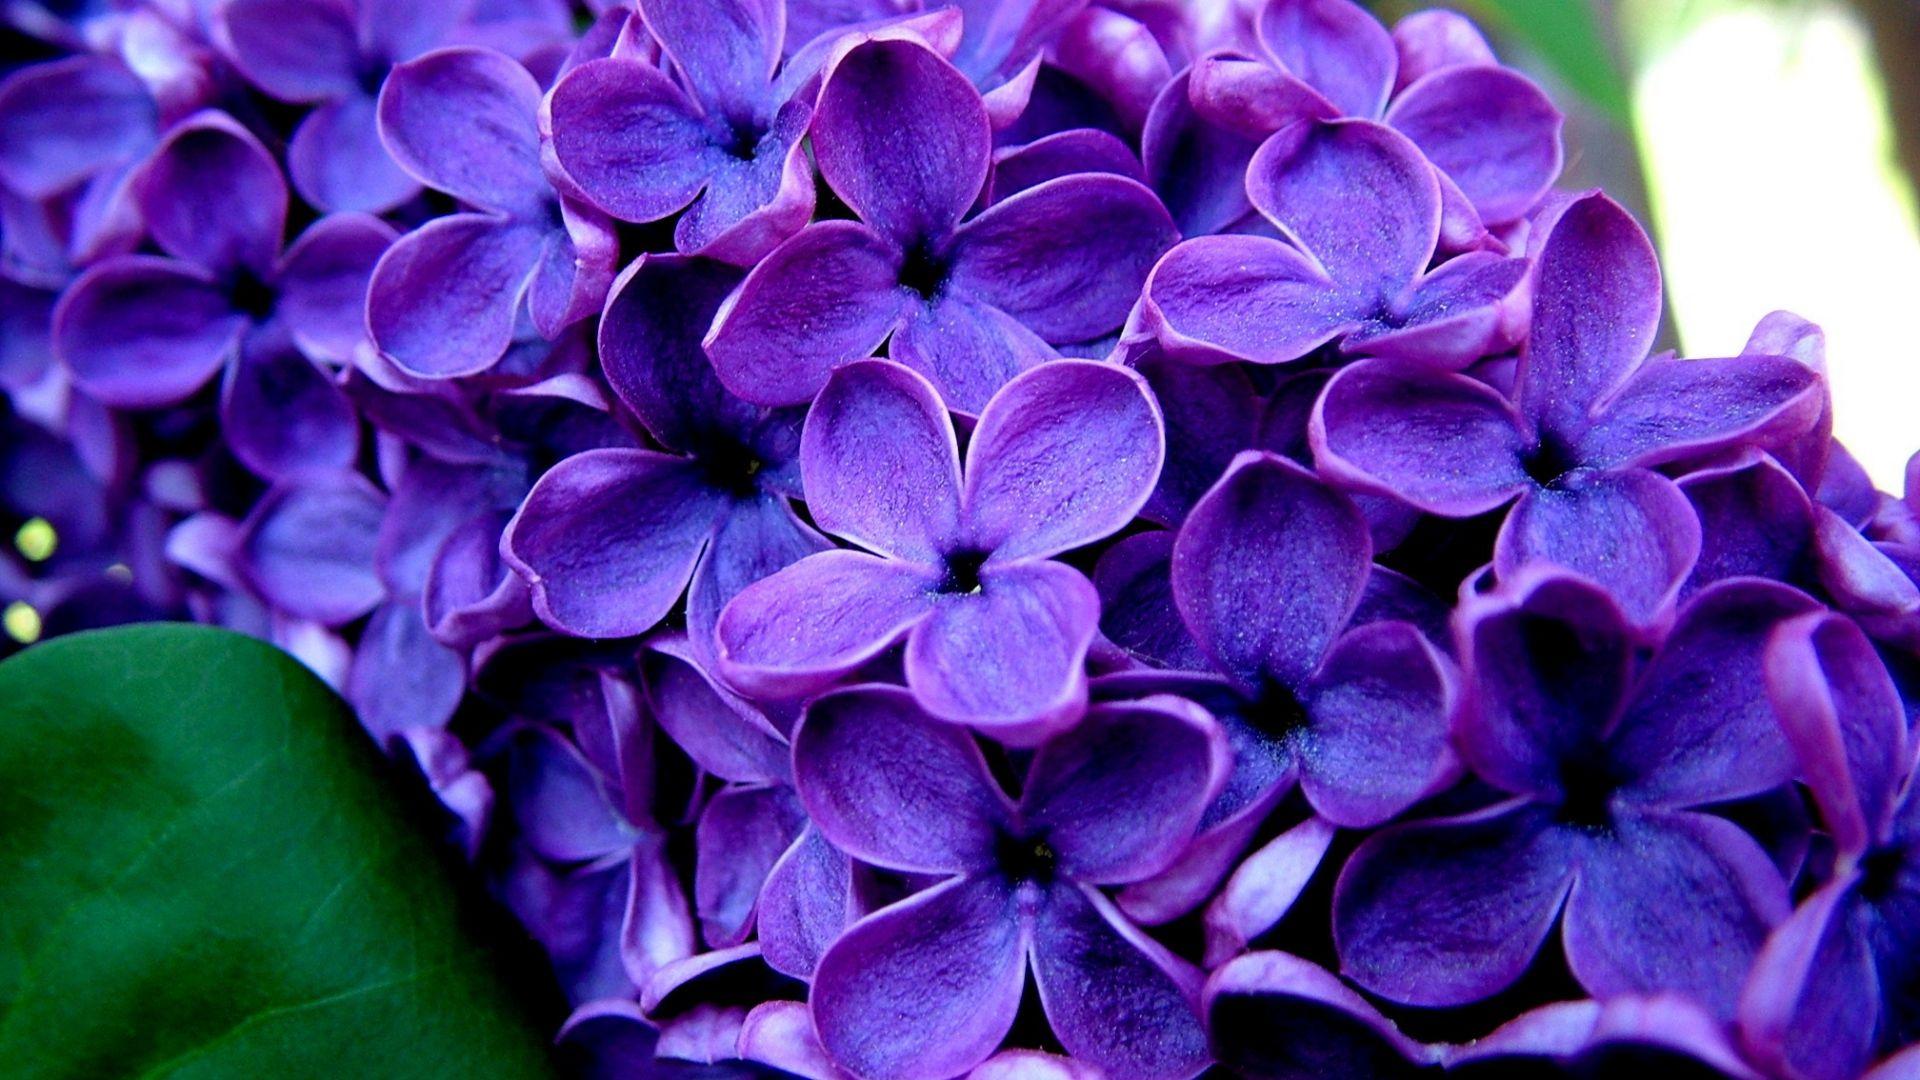 Lilac orgona flowers virgok pinterest lilacs lilac orgona izmirmasajfo Images